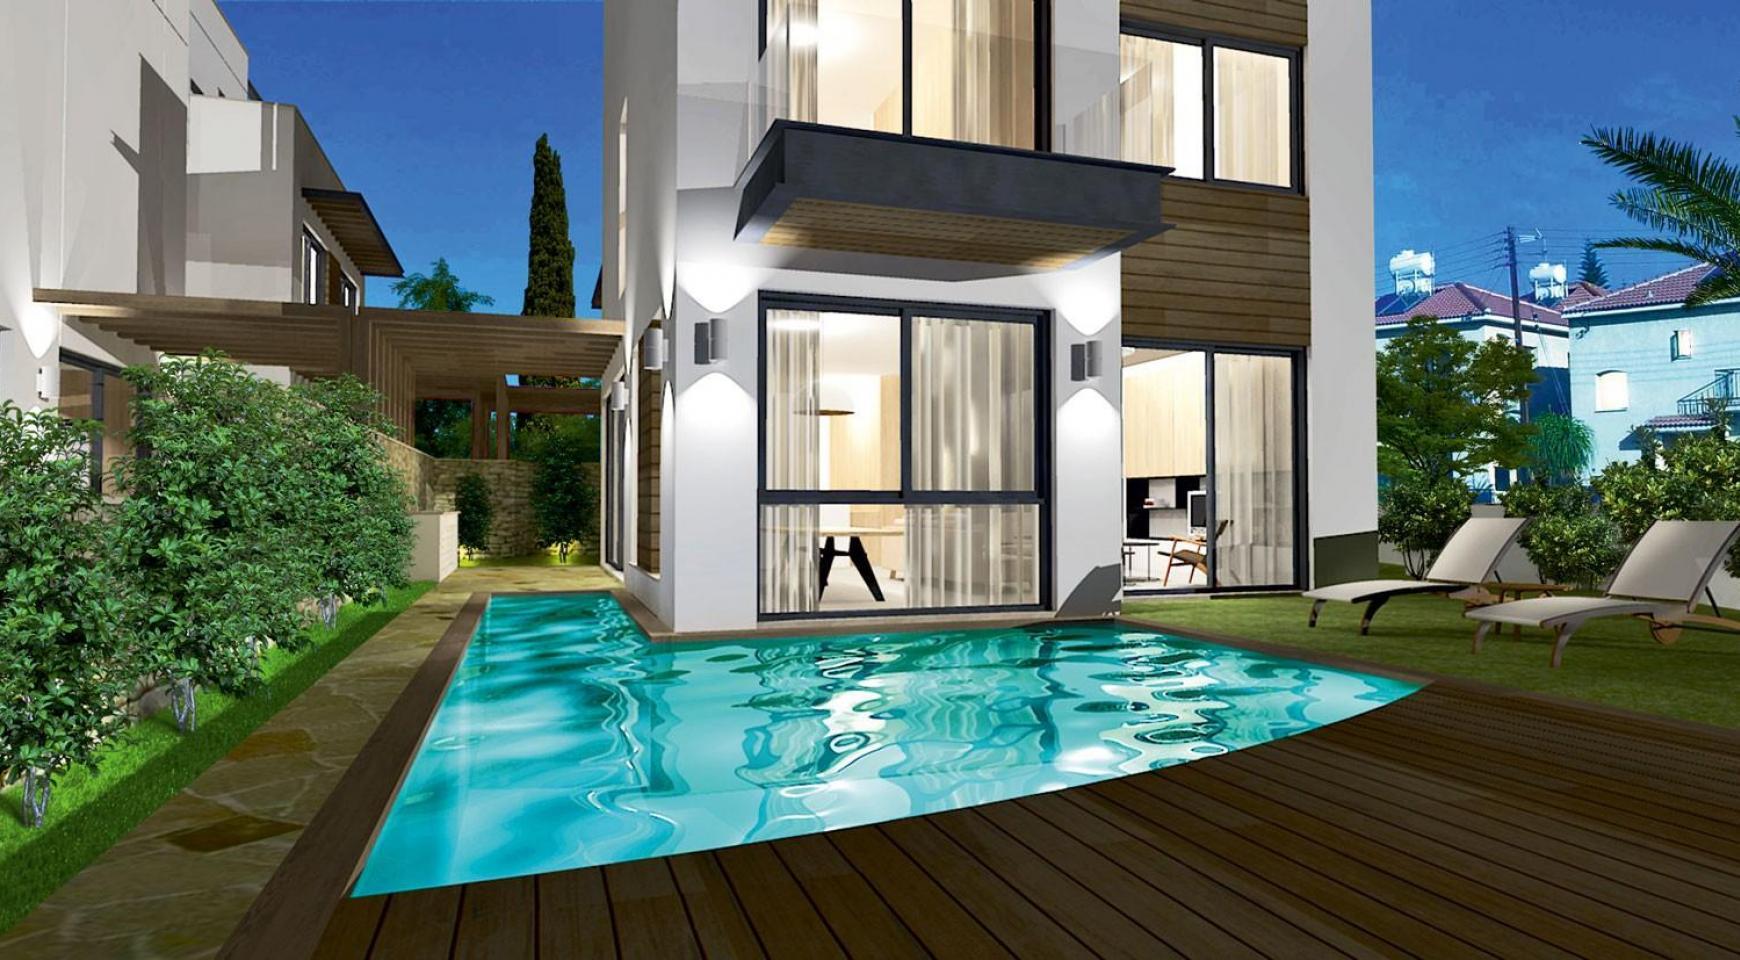 Spacious 4 Bedroom Villa in a New Complex in Agios Athanasios - 5